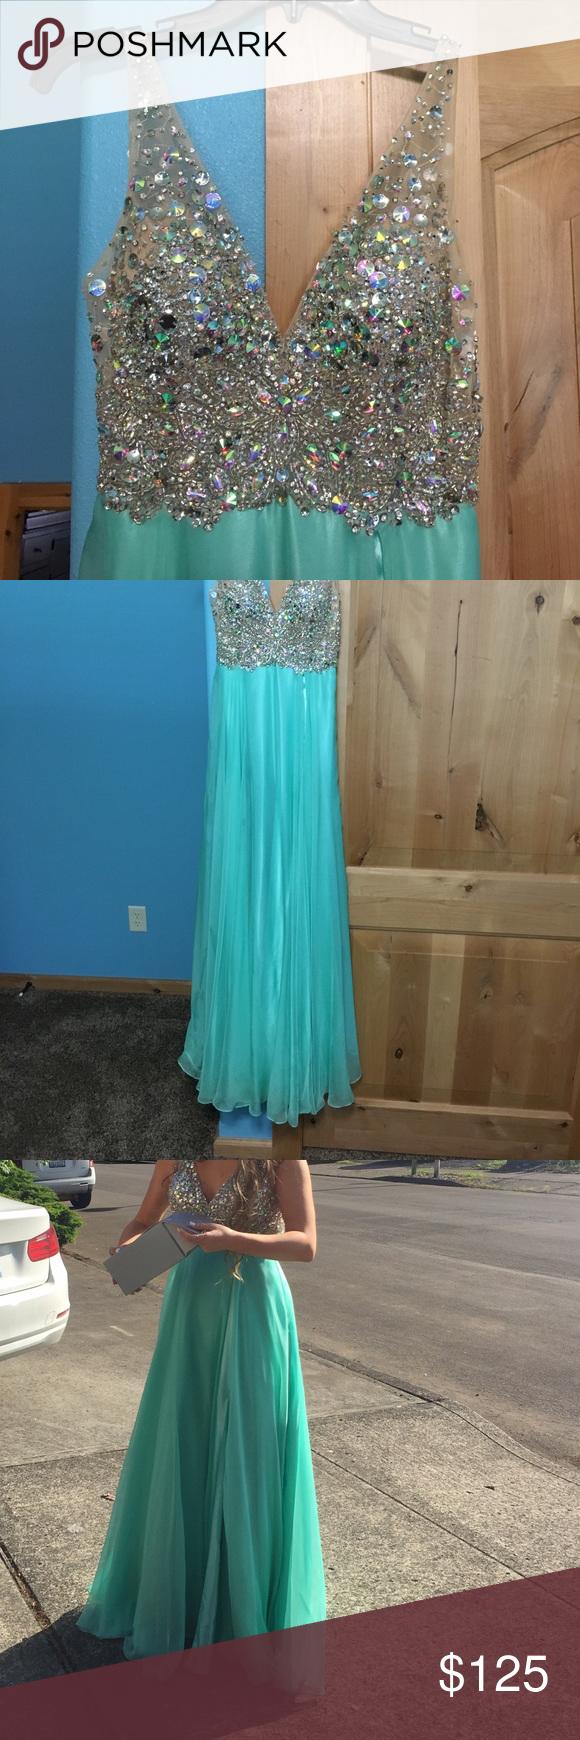 Beautiful turquoise prom dress turquoise prom dresses